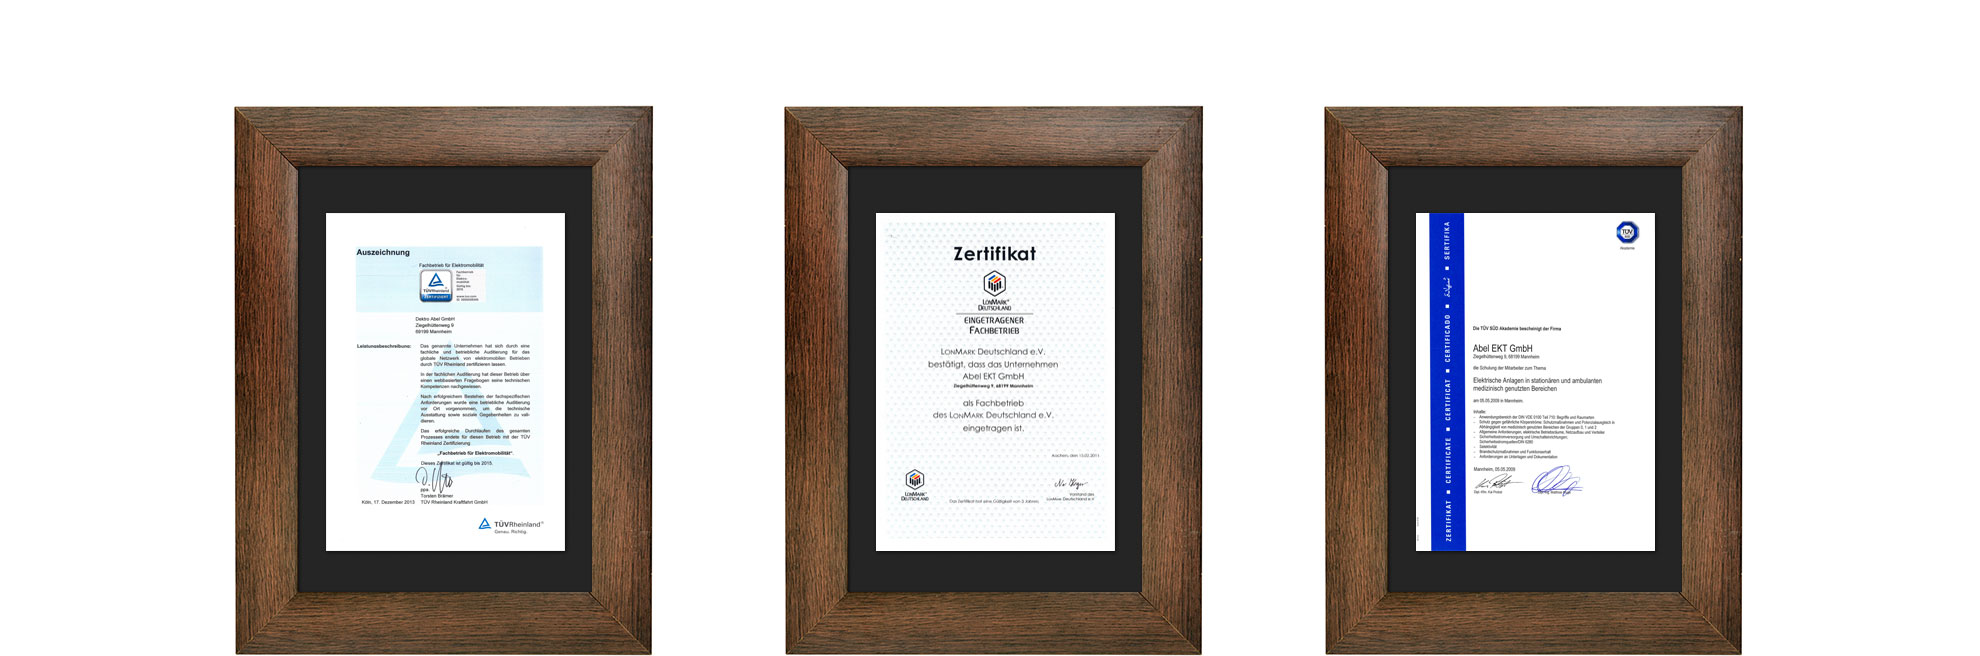 zertifikate-banner_februar2016